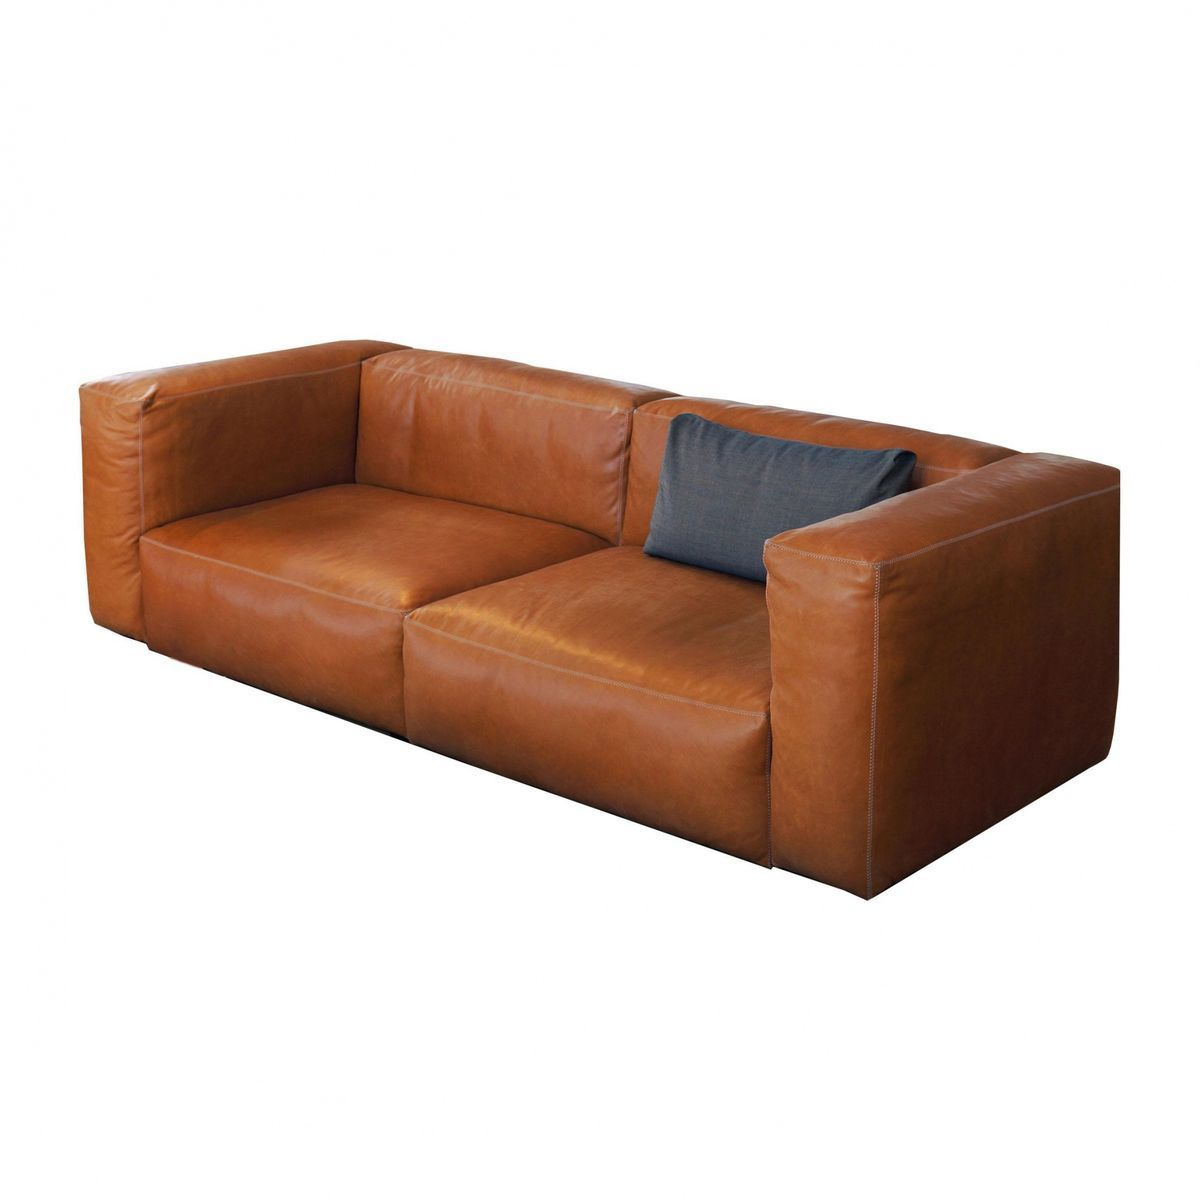 Soft Leather Sofa: Mags Soft 2,5 Seater Leather Sofa